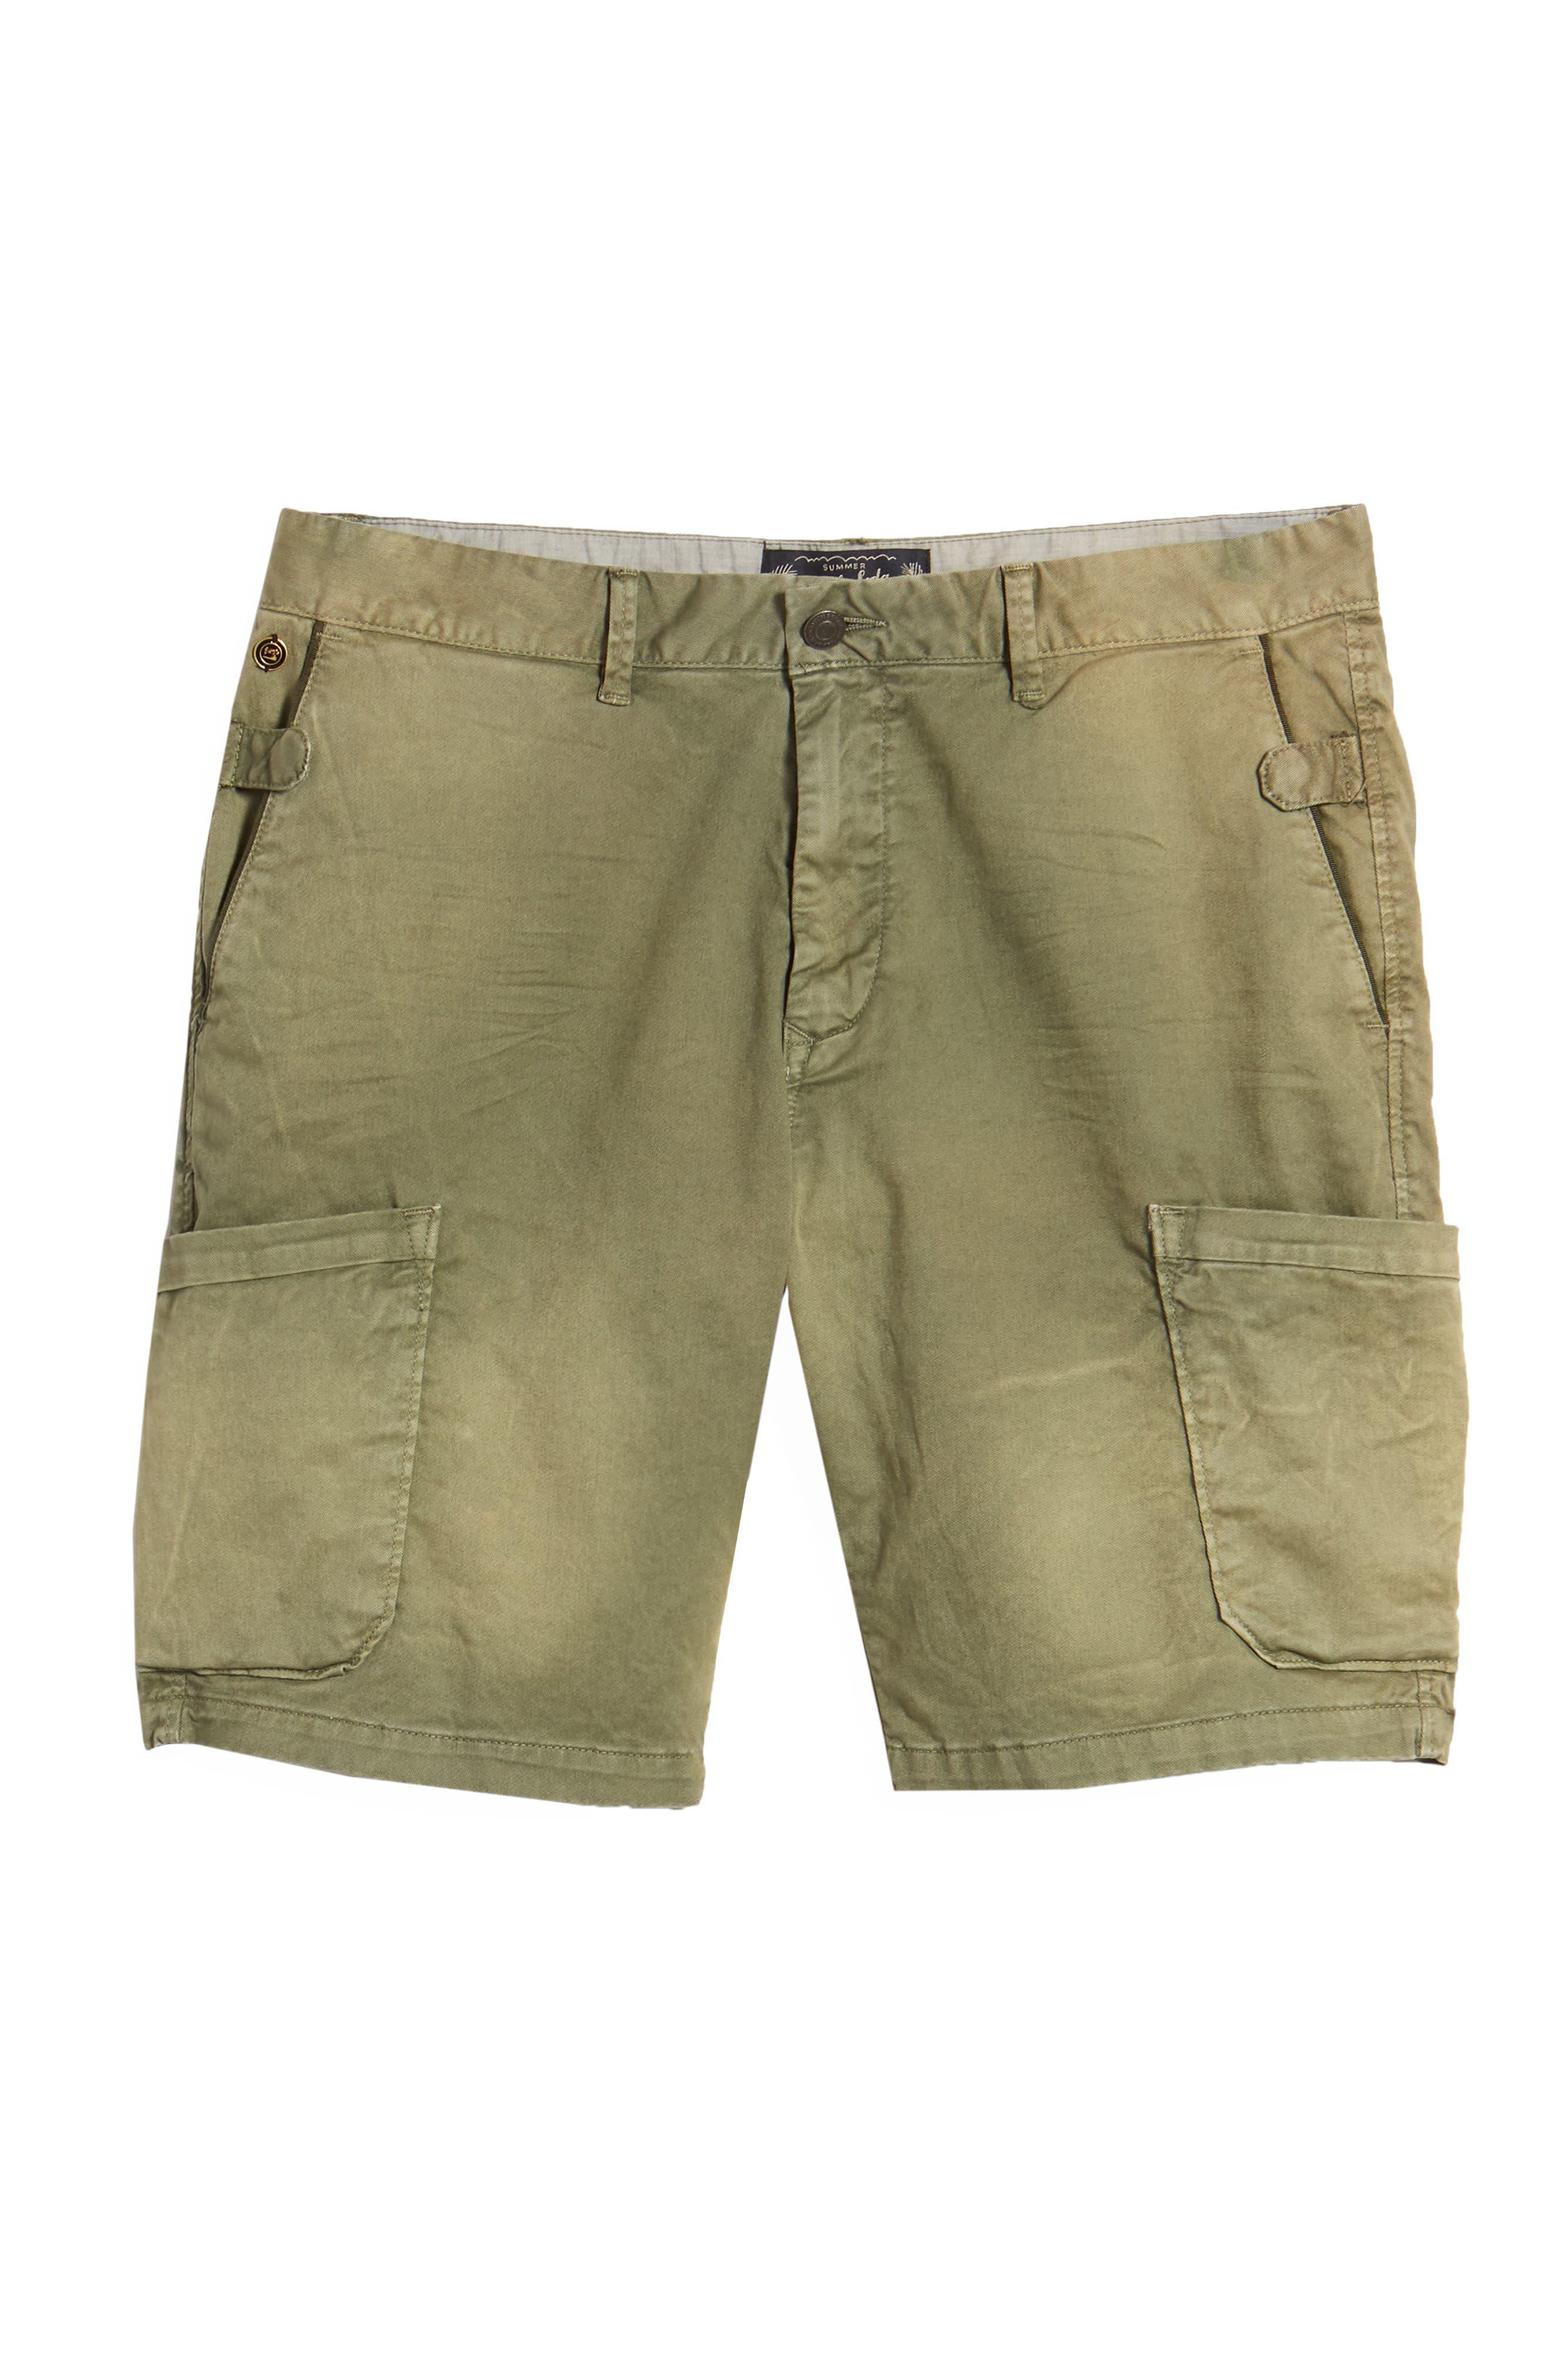 Washed Cargo Shorts,                             Alternate thumbnail 6, color,                             310